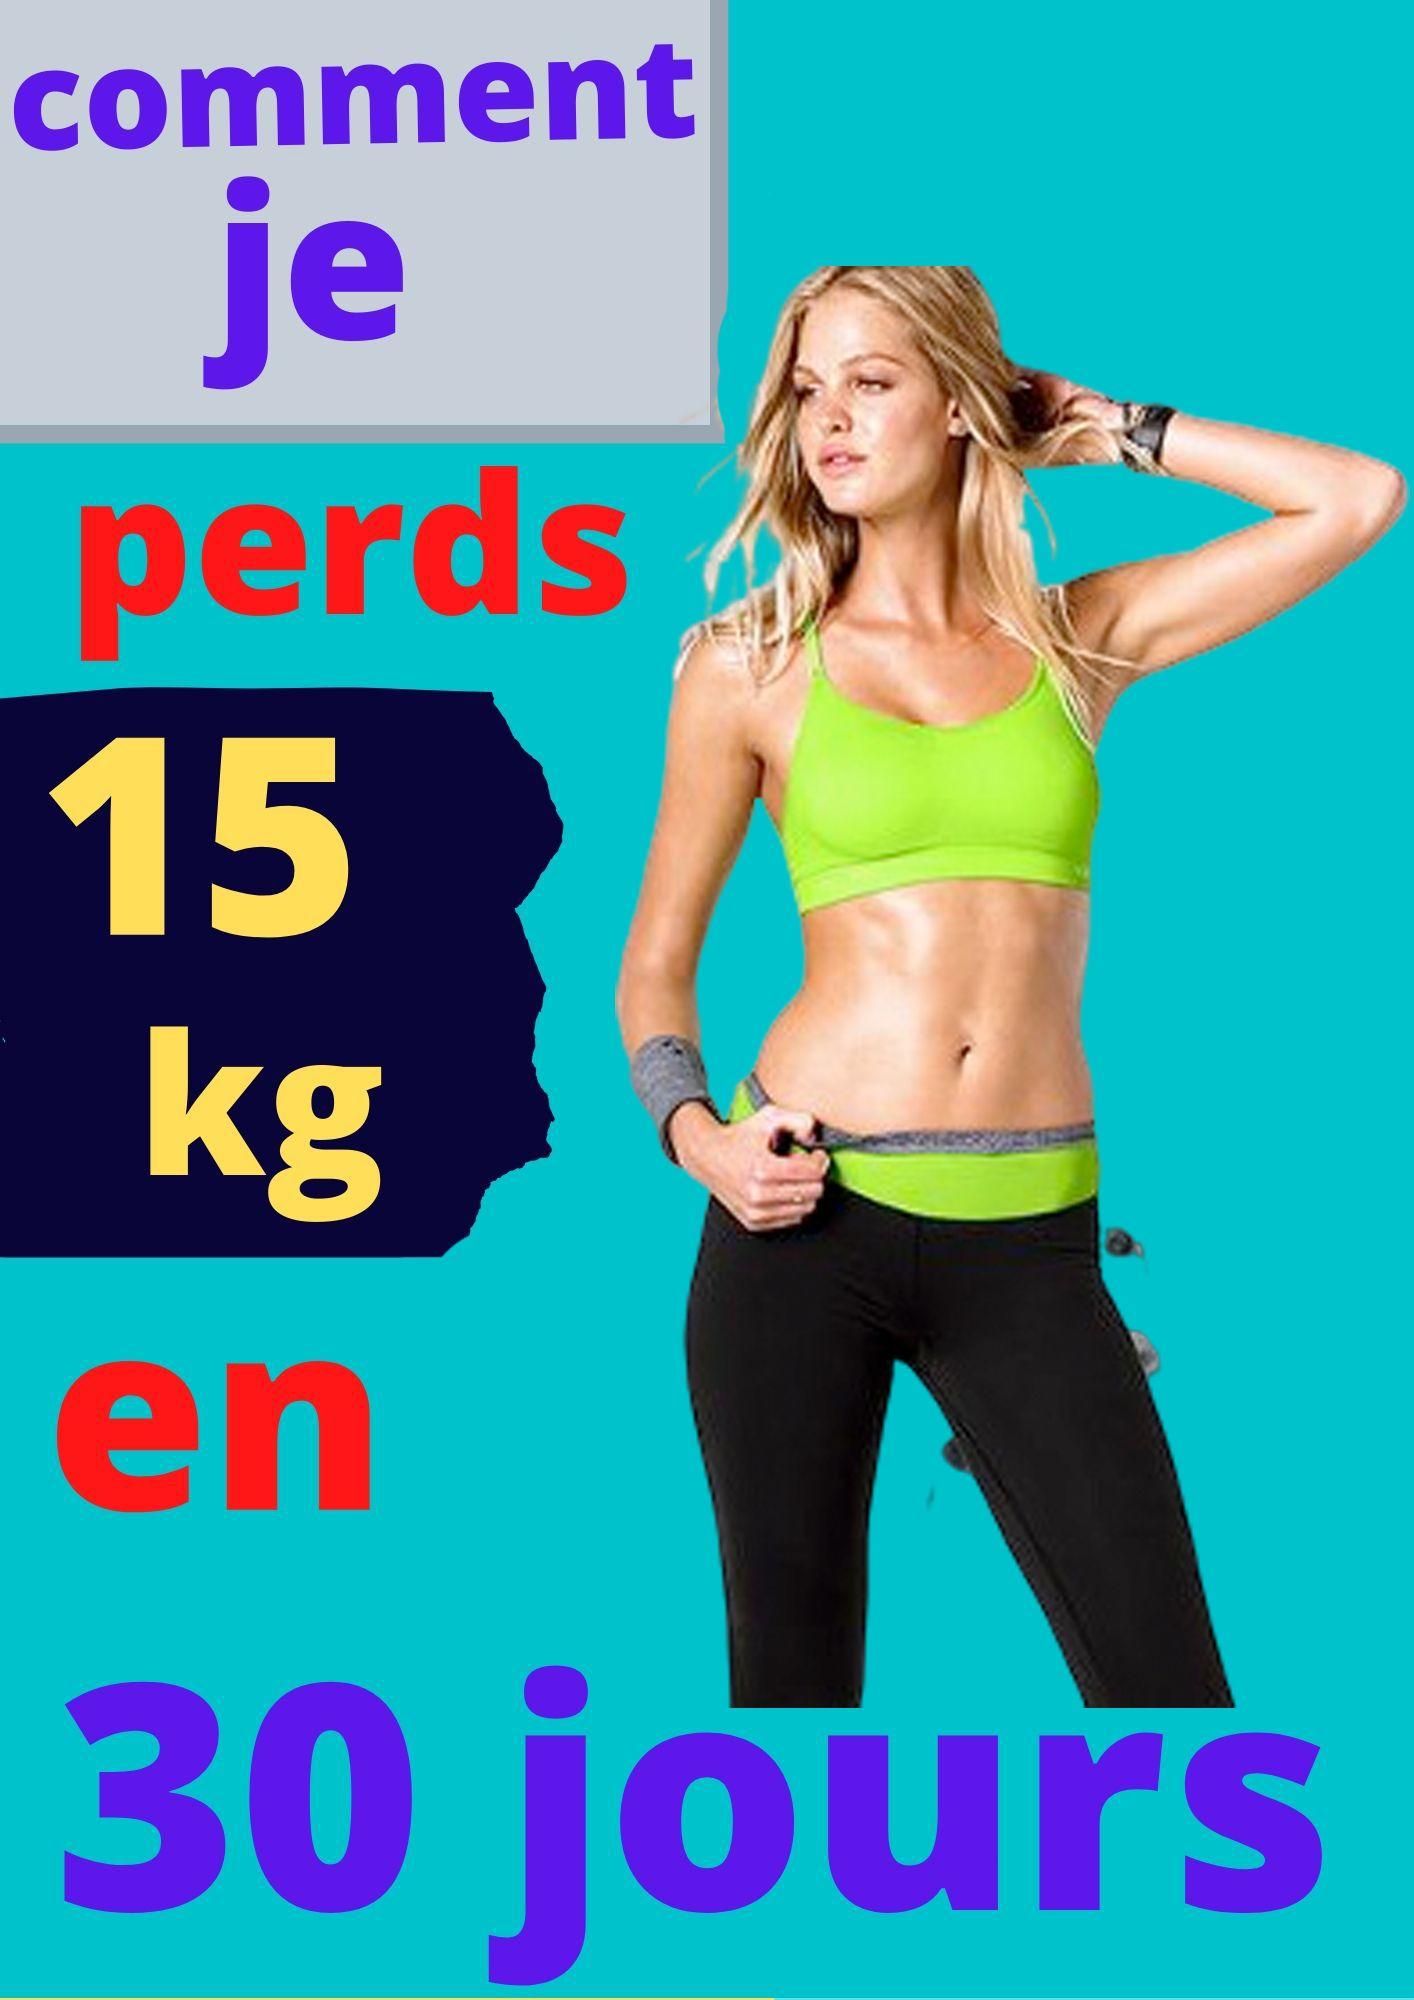 enveloppement corporel de perte de poids Melbourne Dickson tn perte de poids